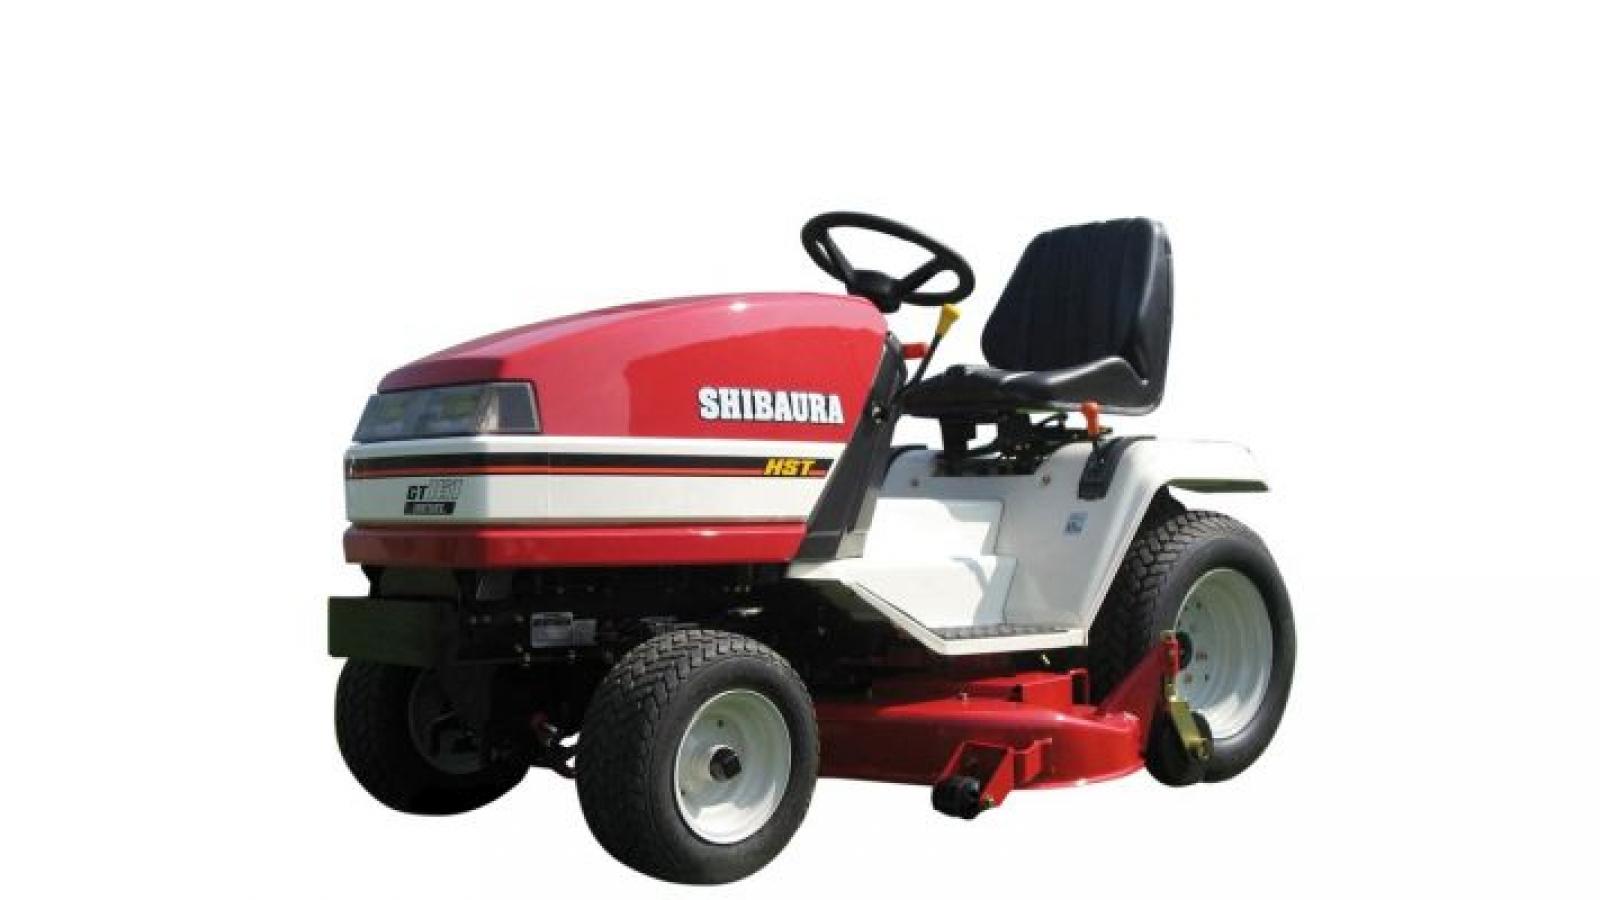 shibaura gt161 lawn and garden tractor shibaura europe rh shibaura com